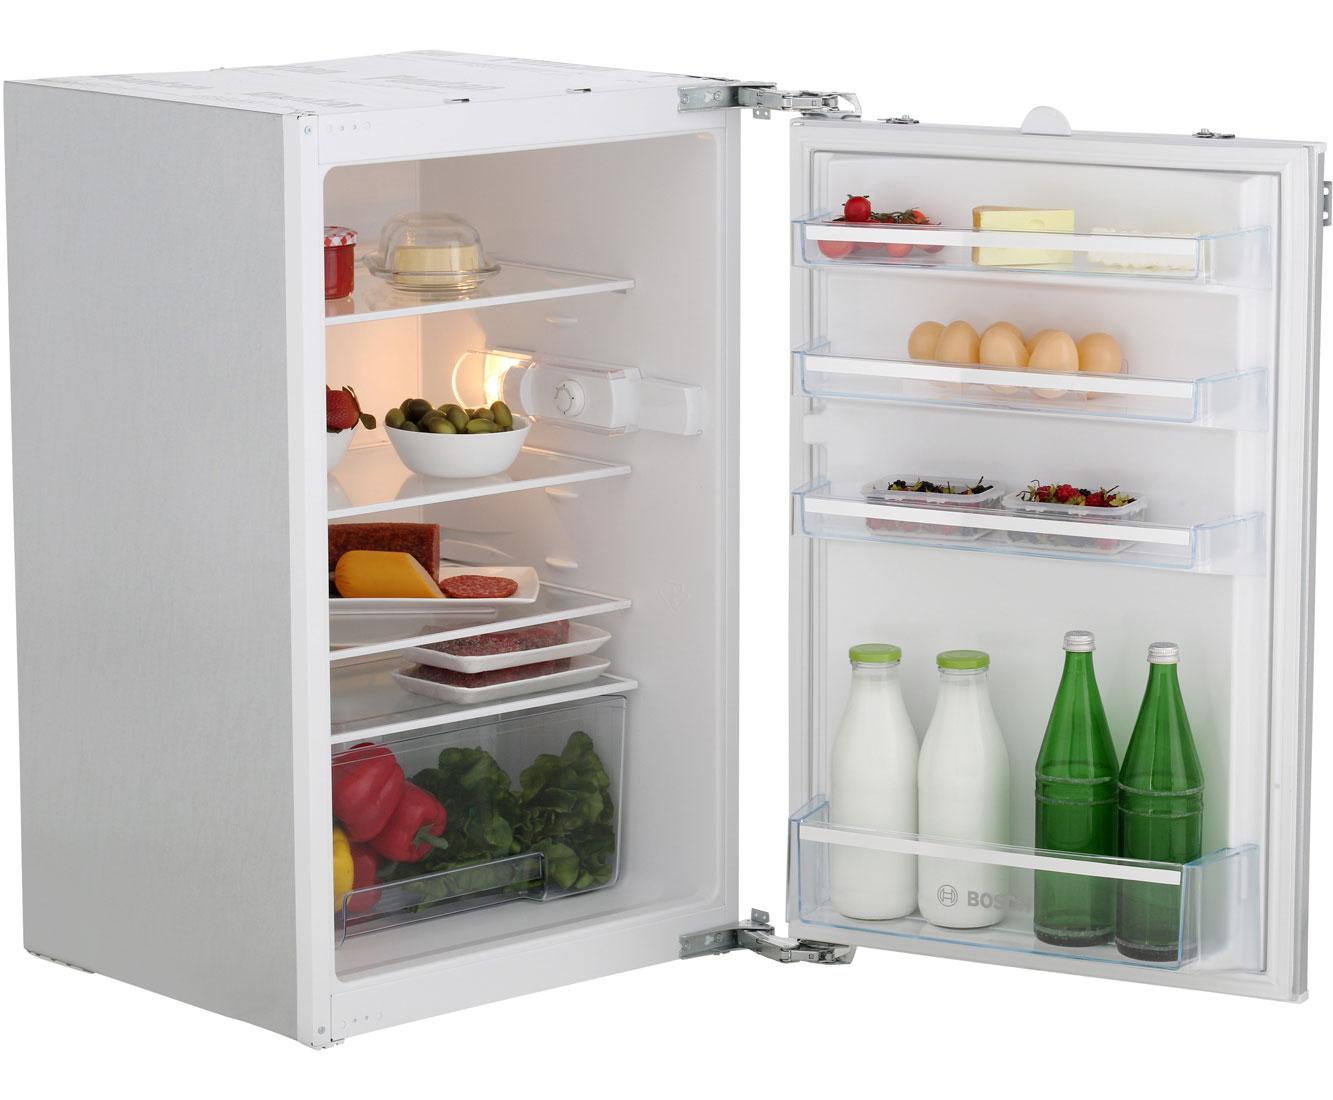 Bosch Kühlschrank Probleme : Bosch serie 2 kir18v51 einbau kühlschrank 88er nische festtür